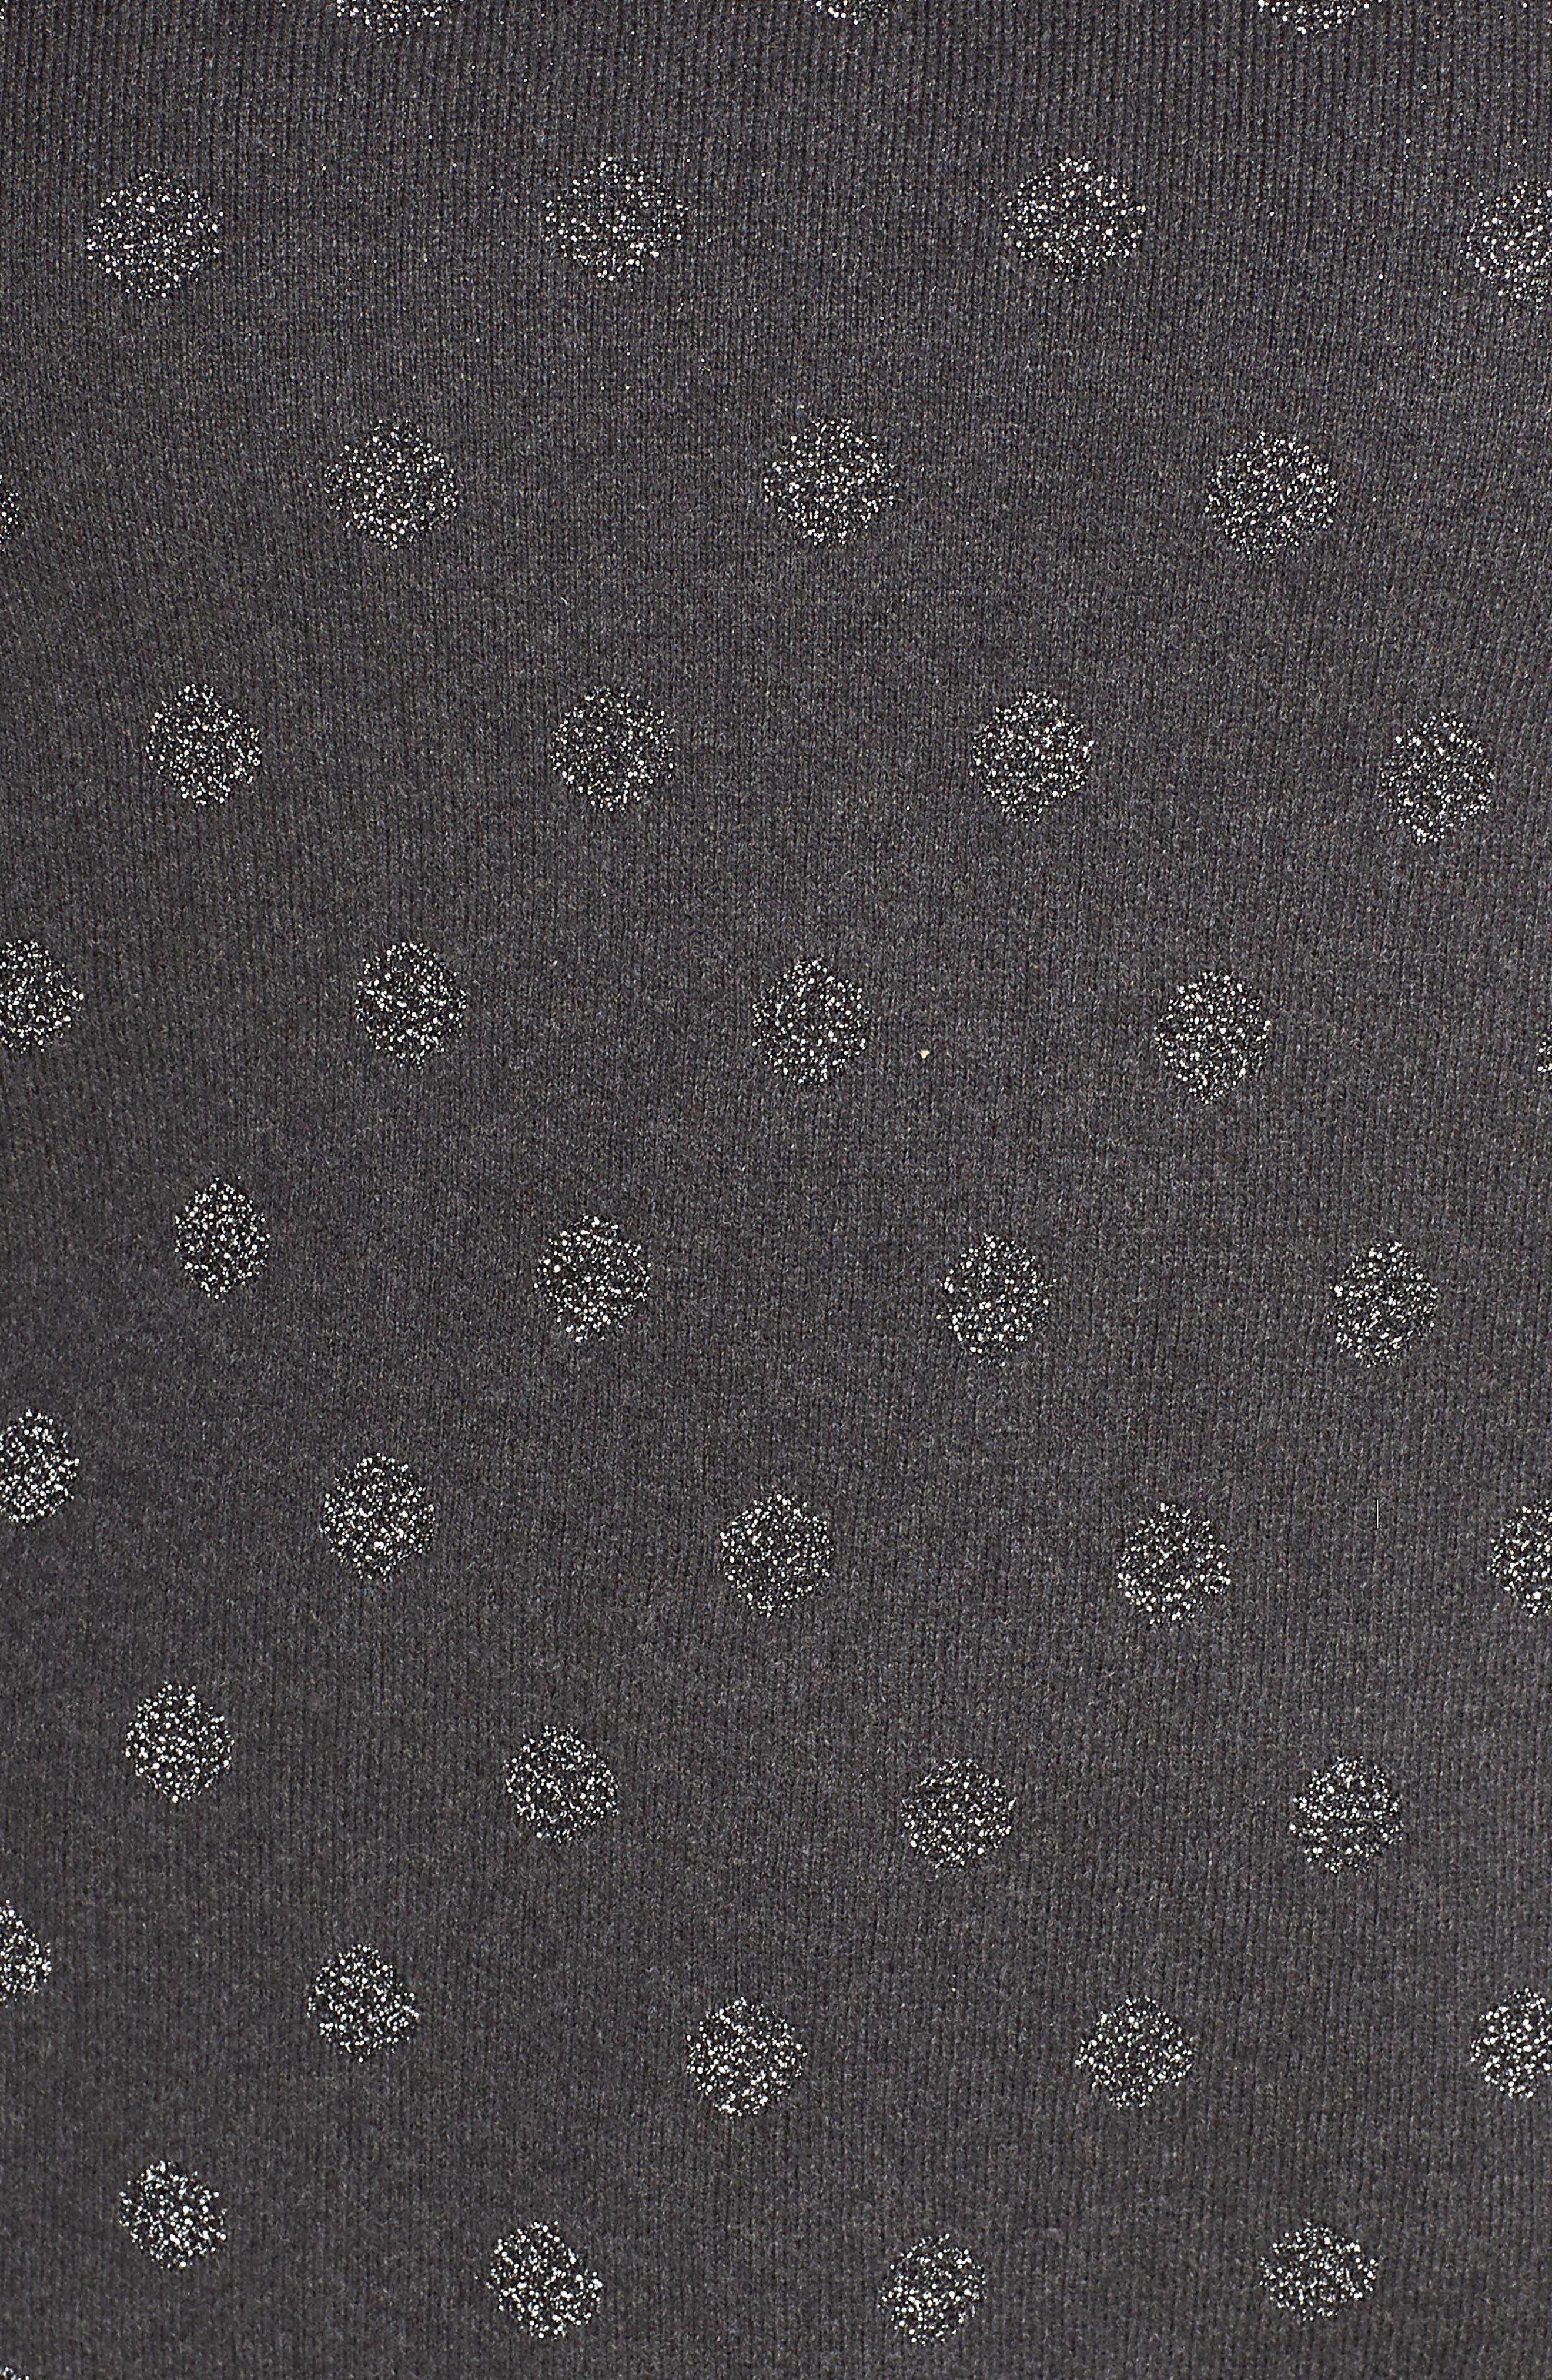 Metalic Dot Pullover,                             Alternate thumbnail 5, color,                             GREY DARK CHARCOAL HEATHER